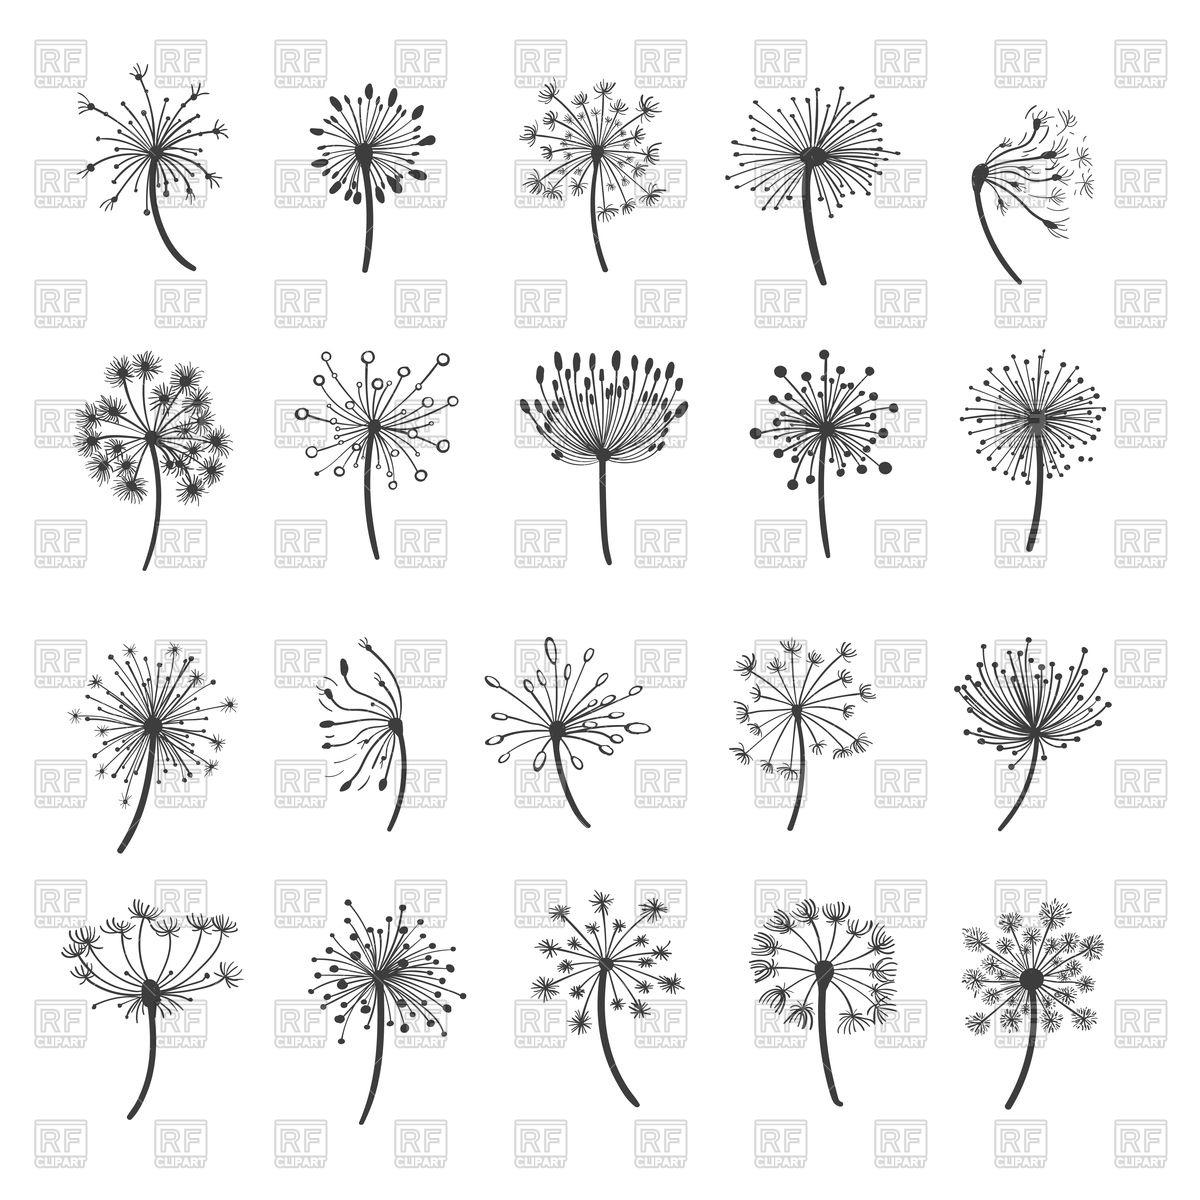 Dandelion silhouettes Stock Vector Image.